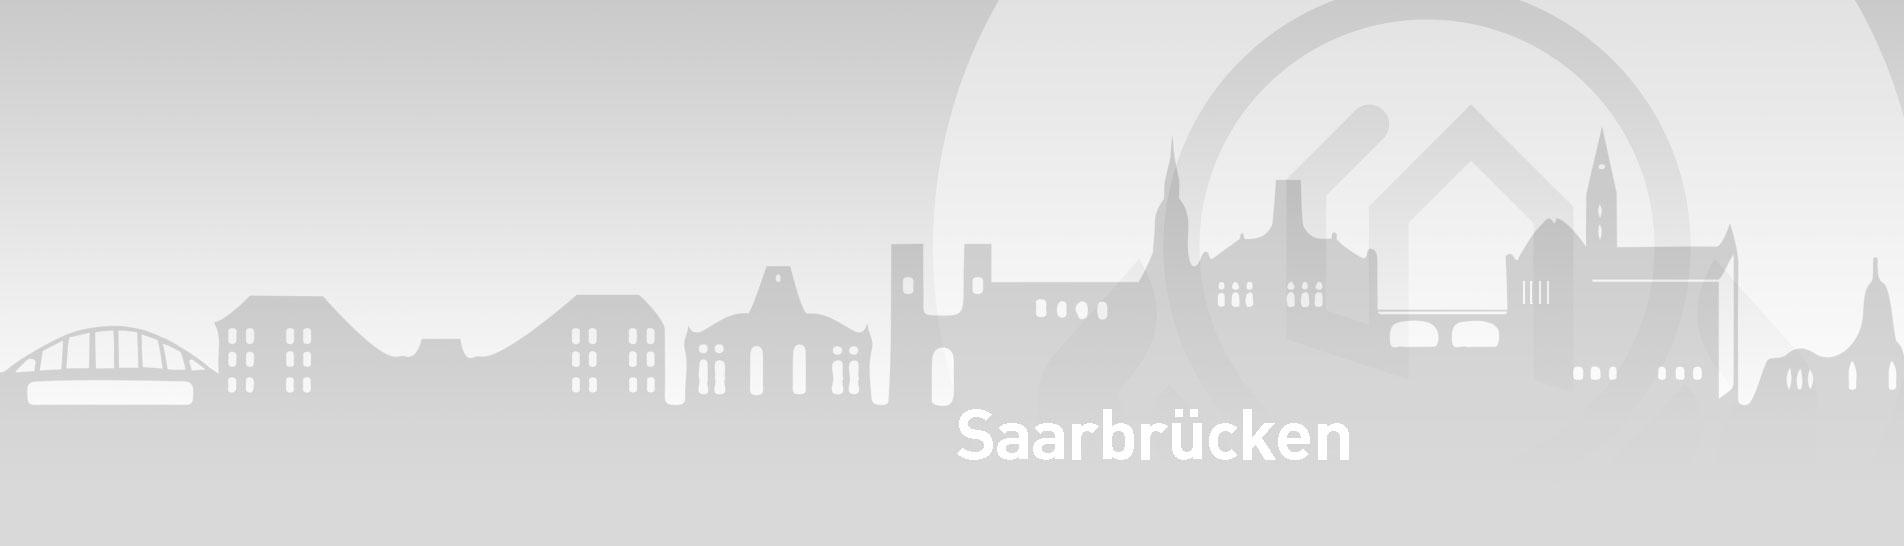 Saarbruecken SENCURINA 1904x546 1 - Saarbrücken